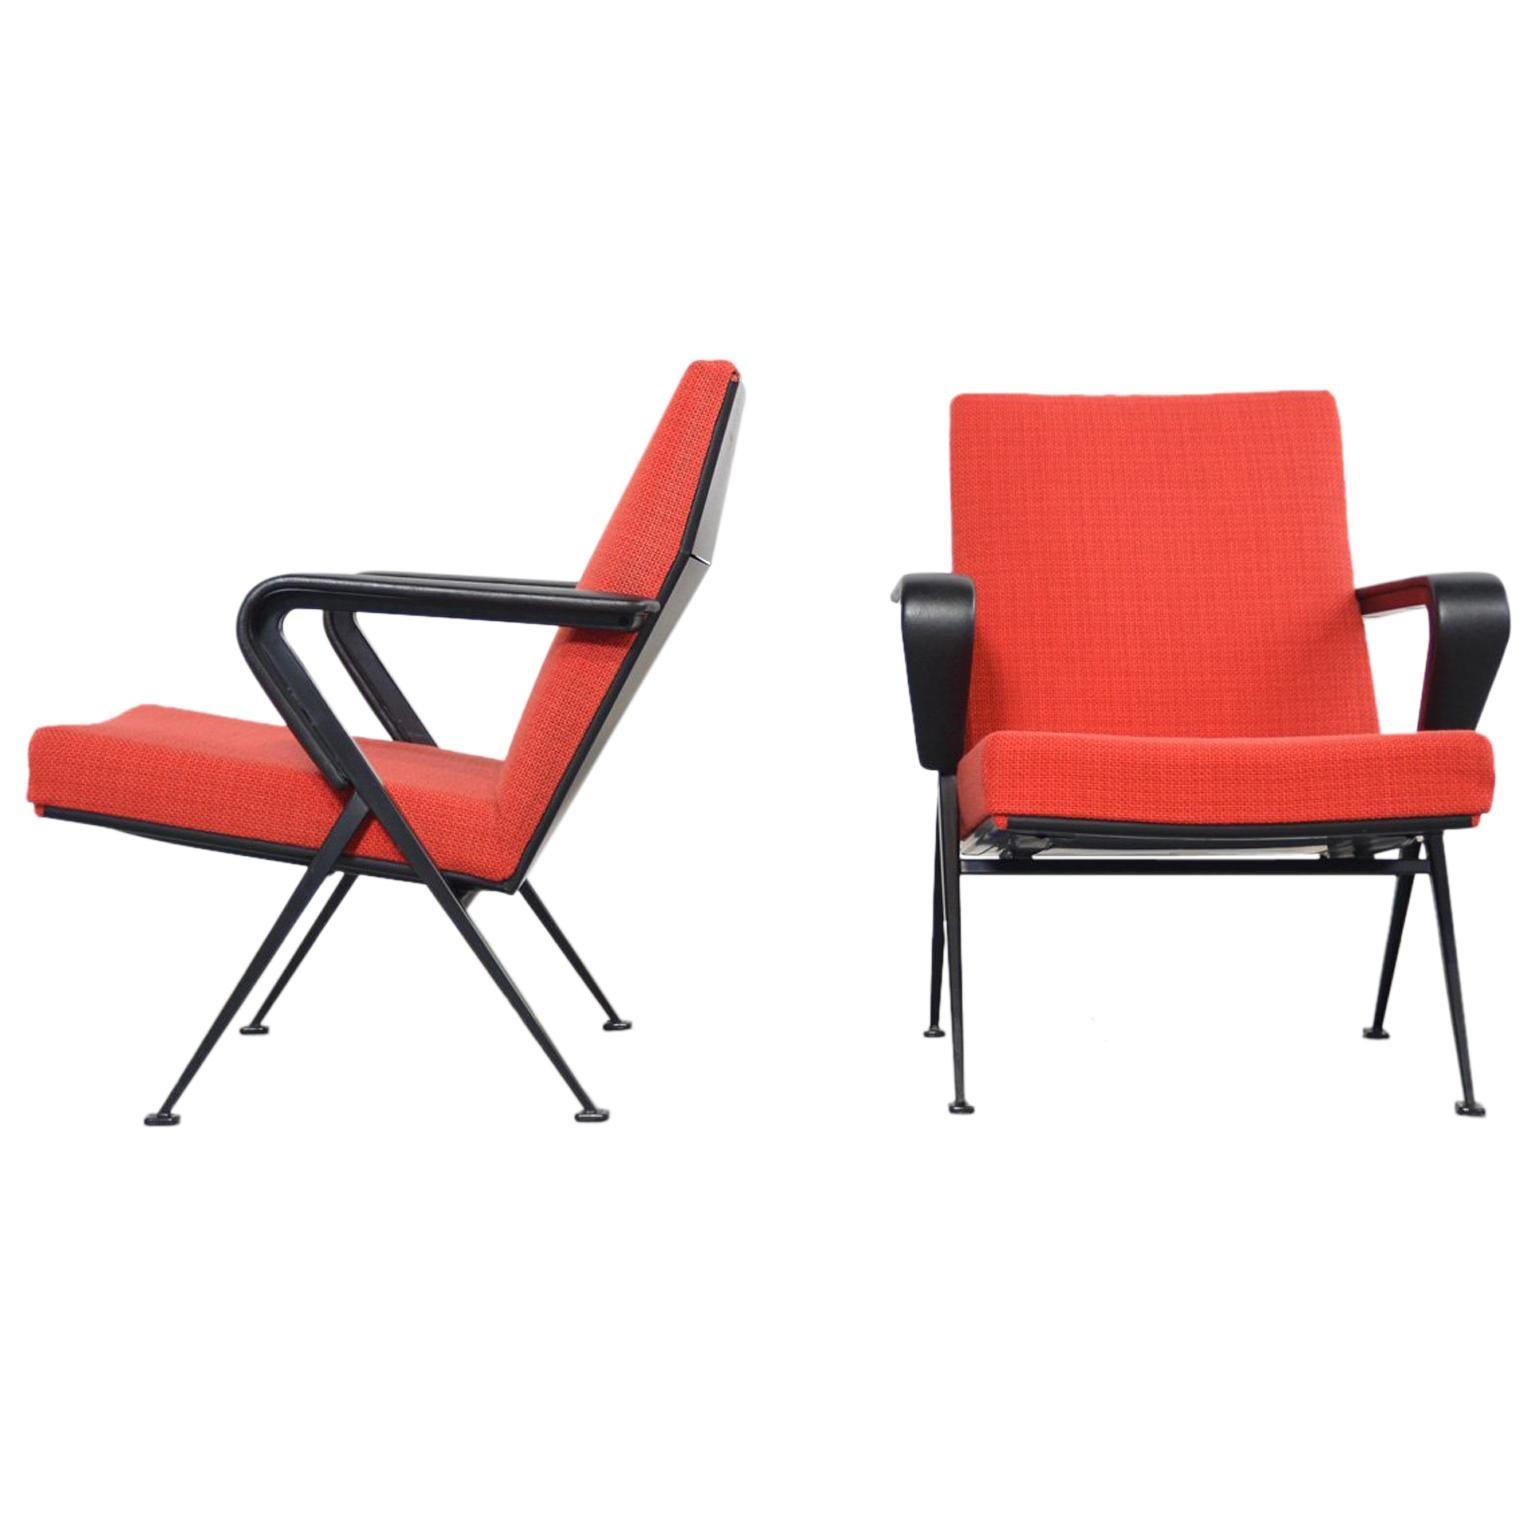 Friso Kramer Repose Chairs for Ahrend de Cirkel, Netherlands